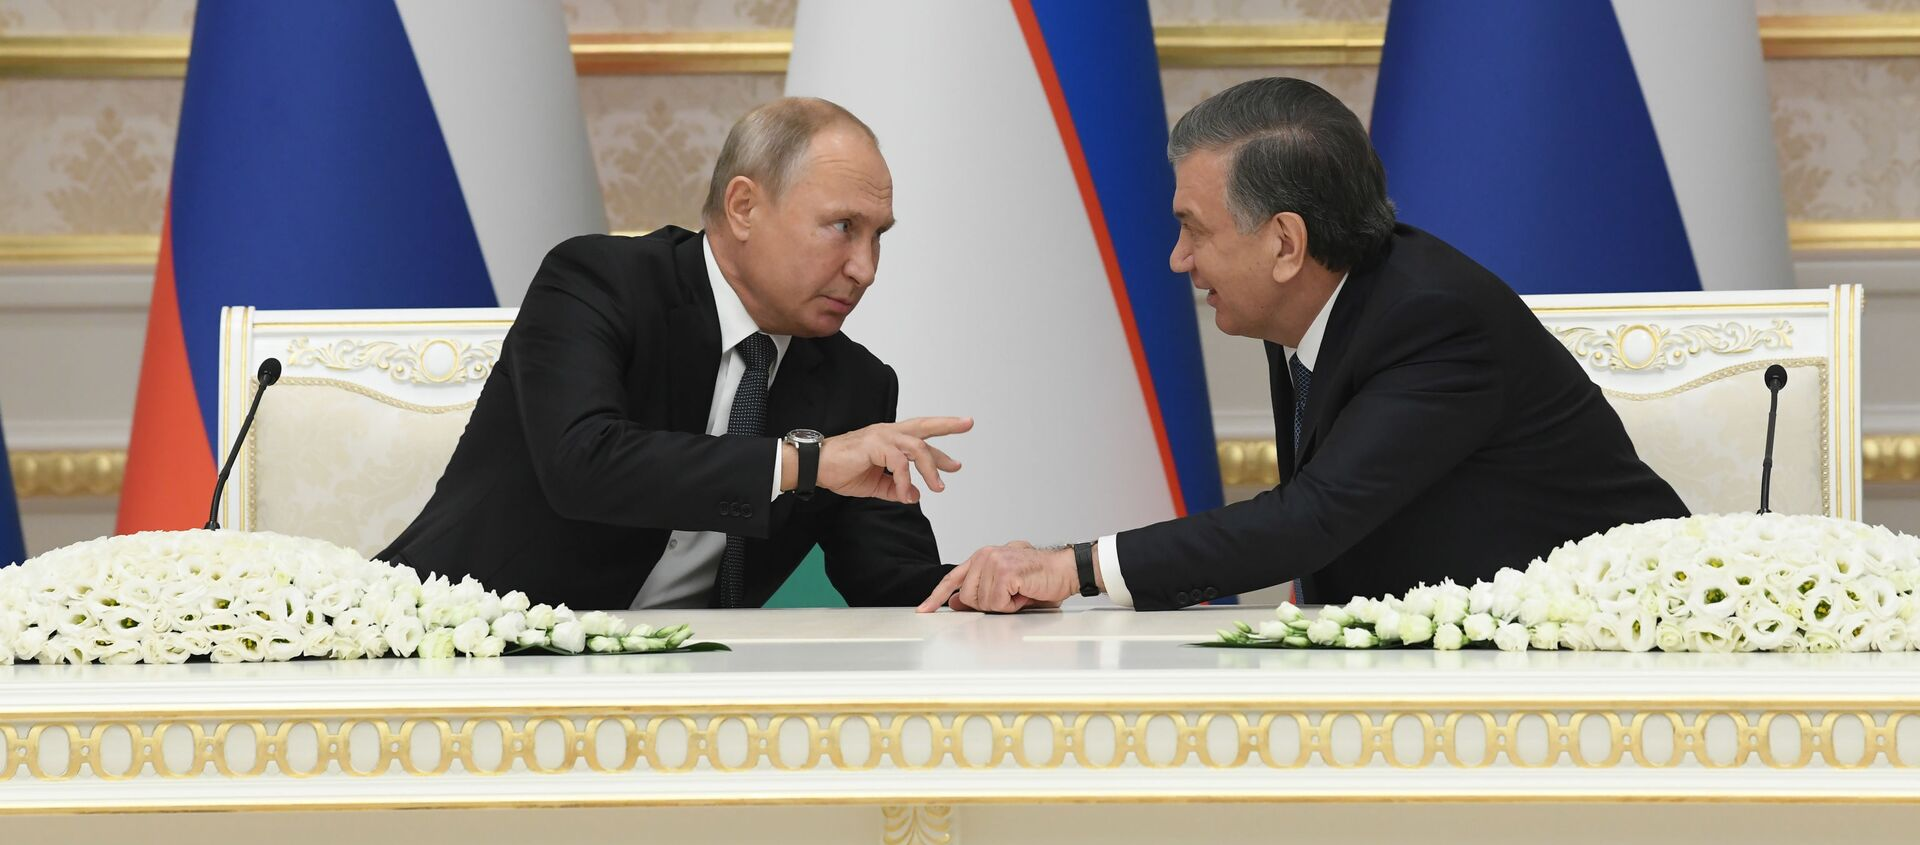 Президент России Владимир Путин и президент Узбекистана Шавкат Мирзиёев - Sputnik Узбекистан, 1920, 12.02.2020